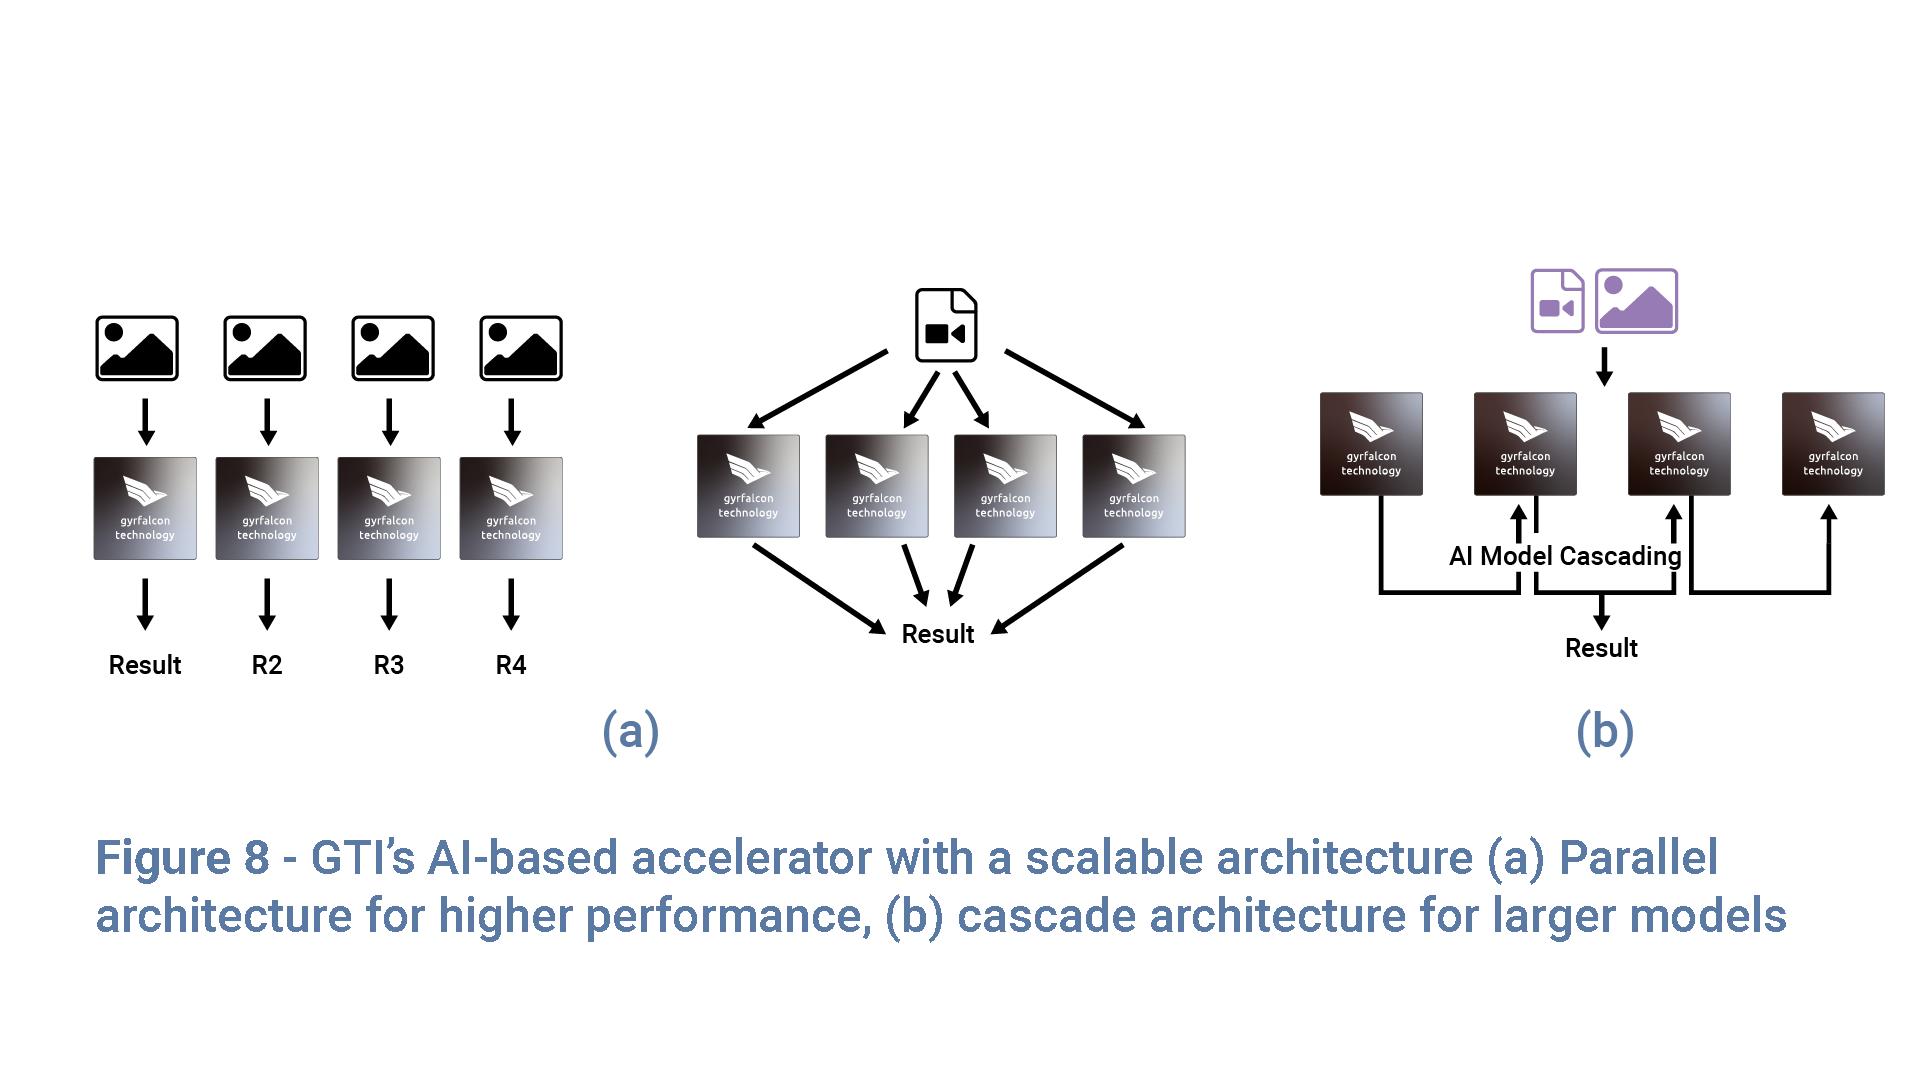 Figure 8 Graphic